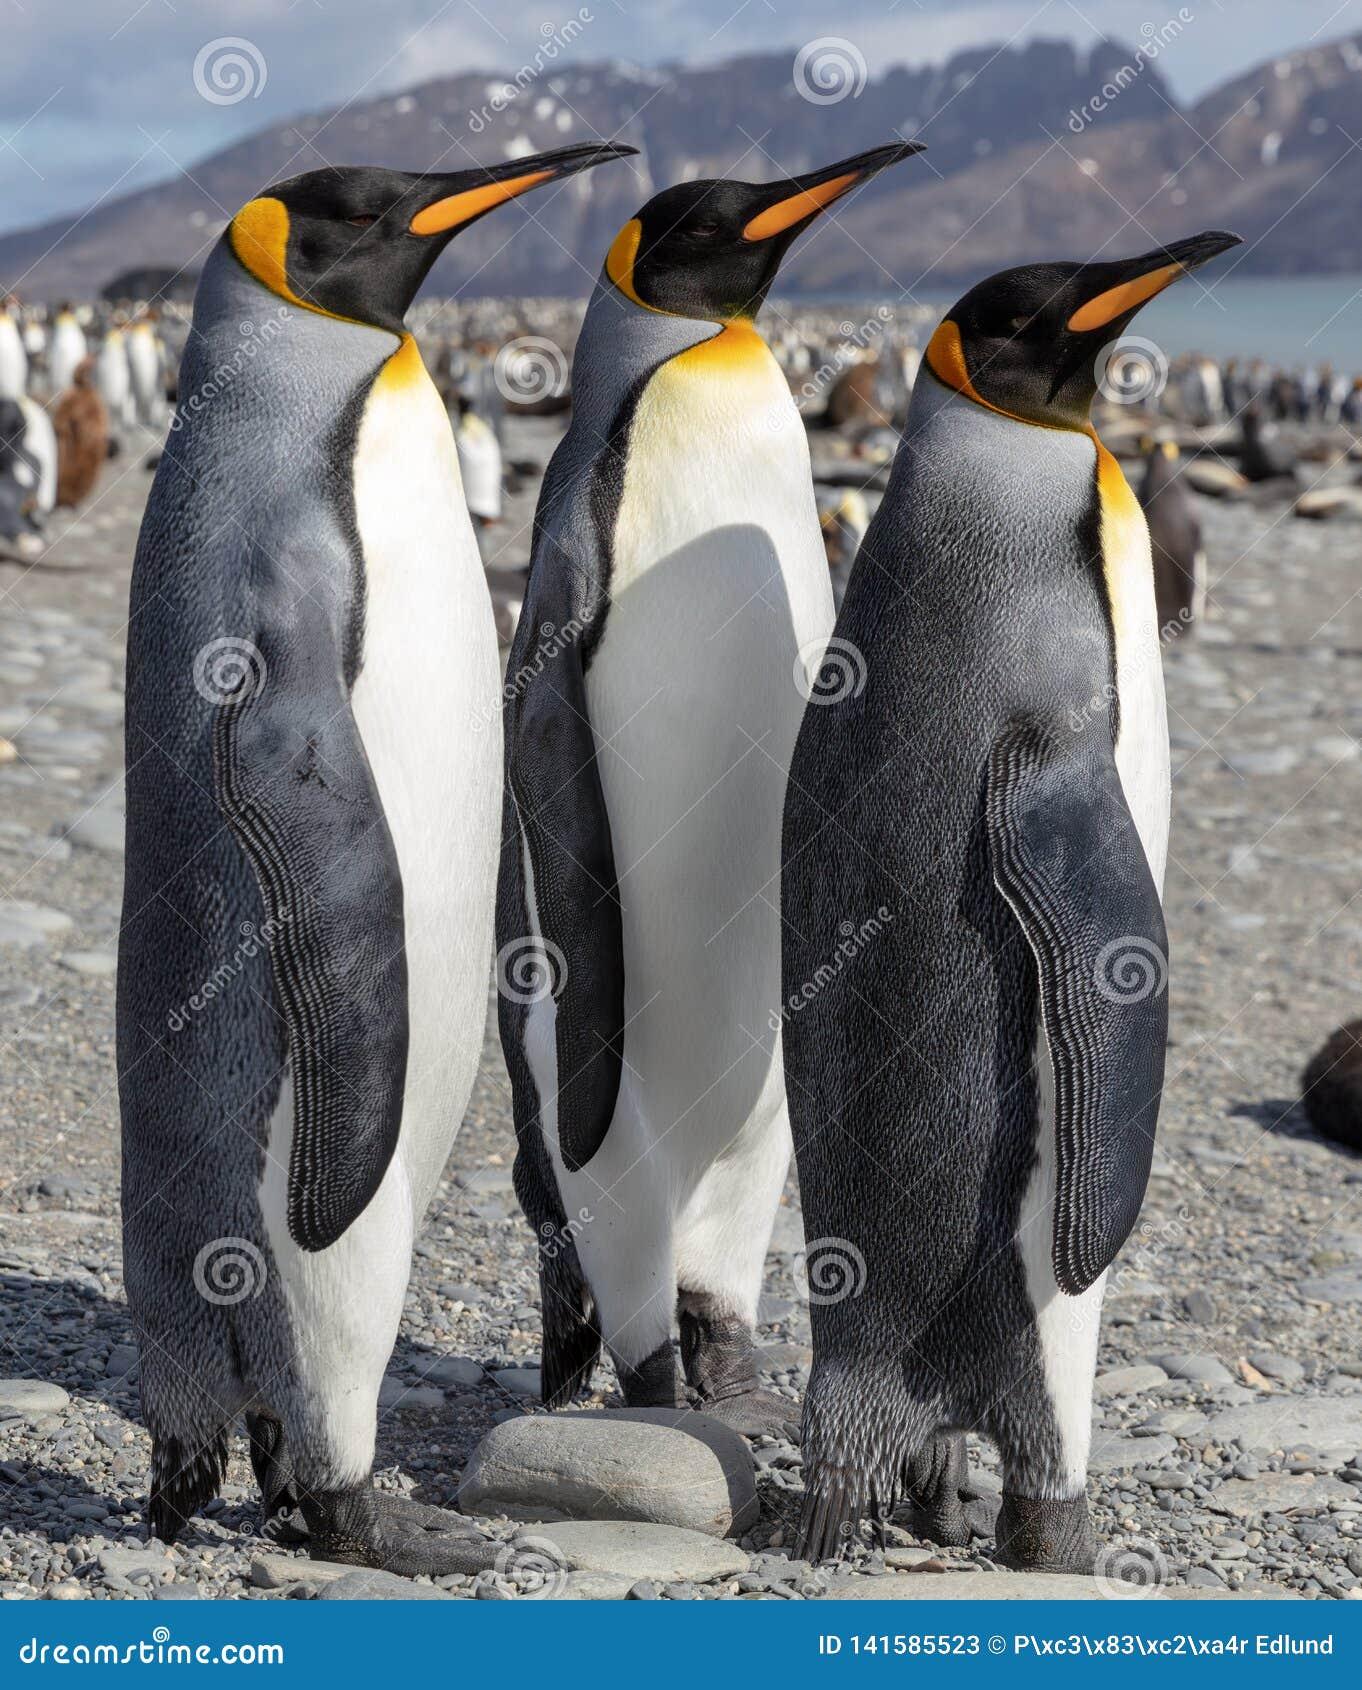 King penguin. Three King penguins socializing on a beach.